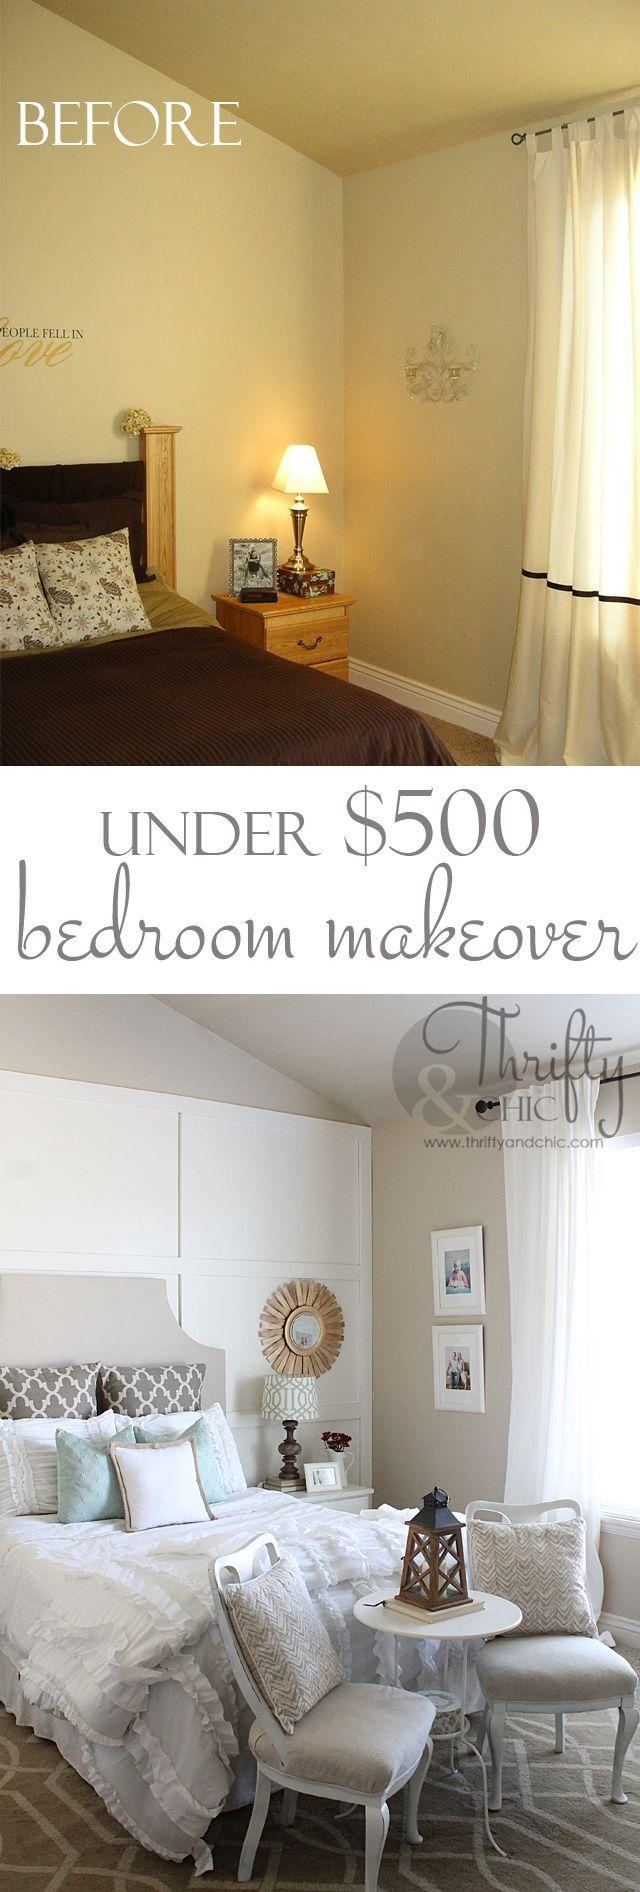 Master bedroom makeover for under $500. Great DIY ideas!